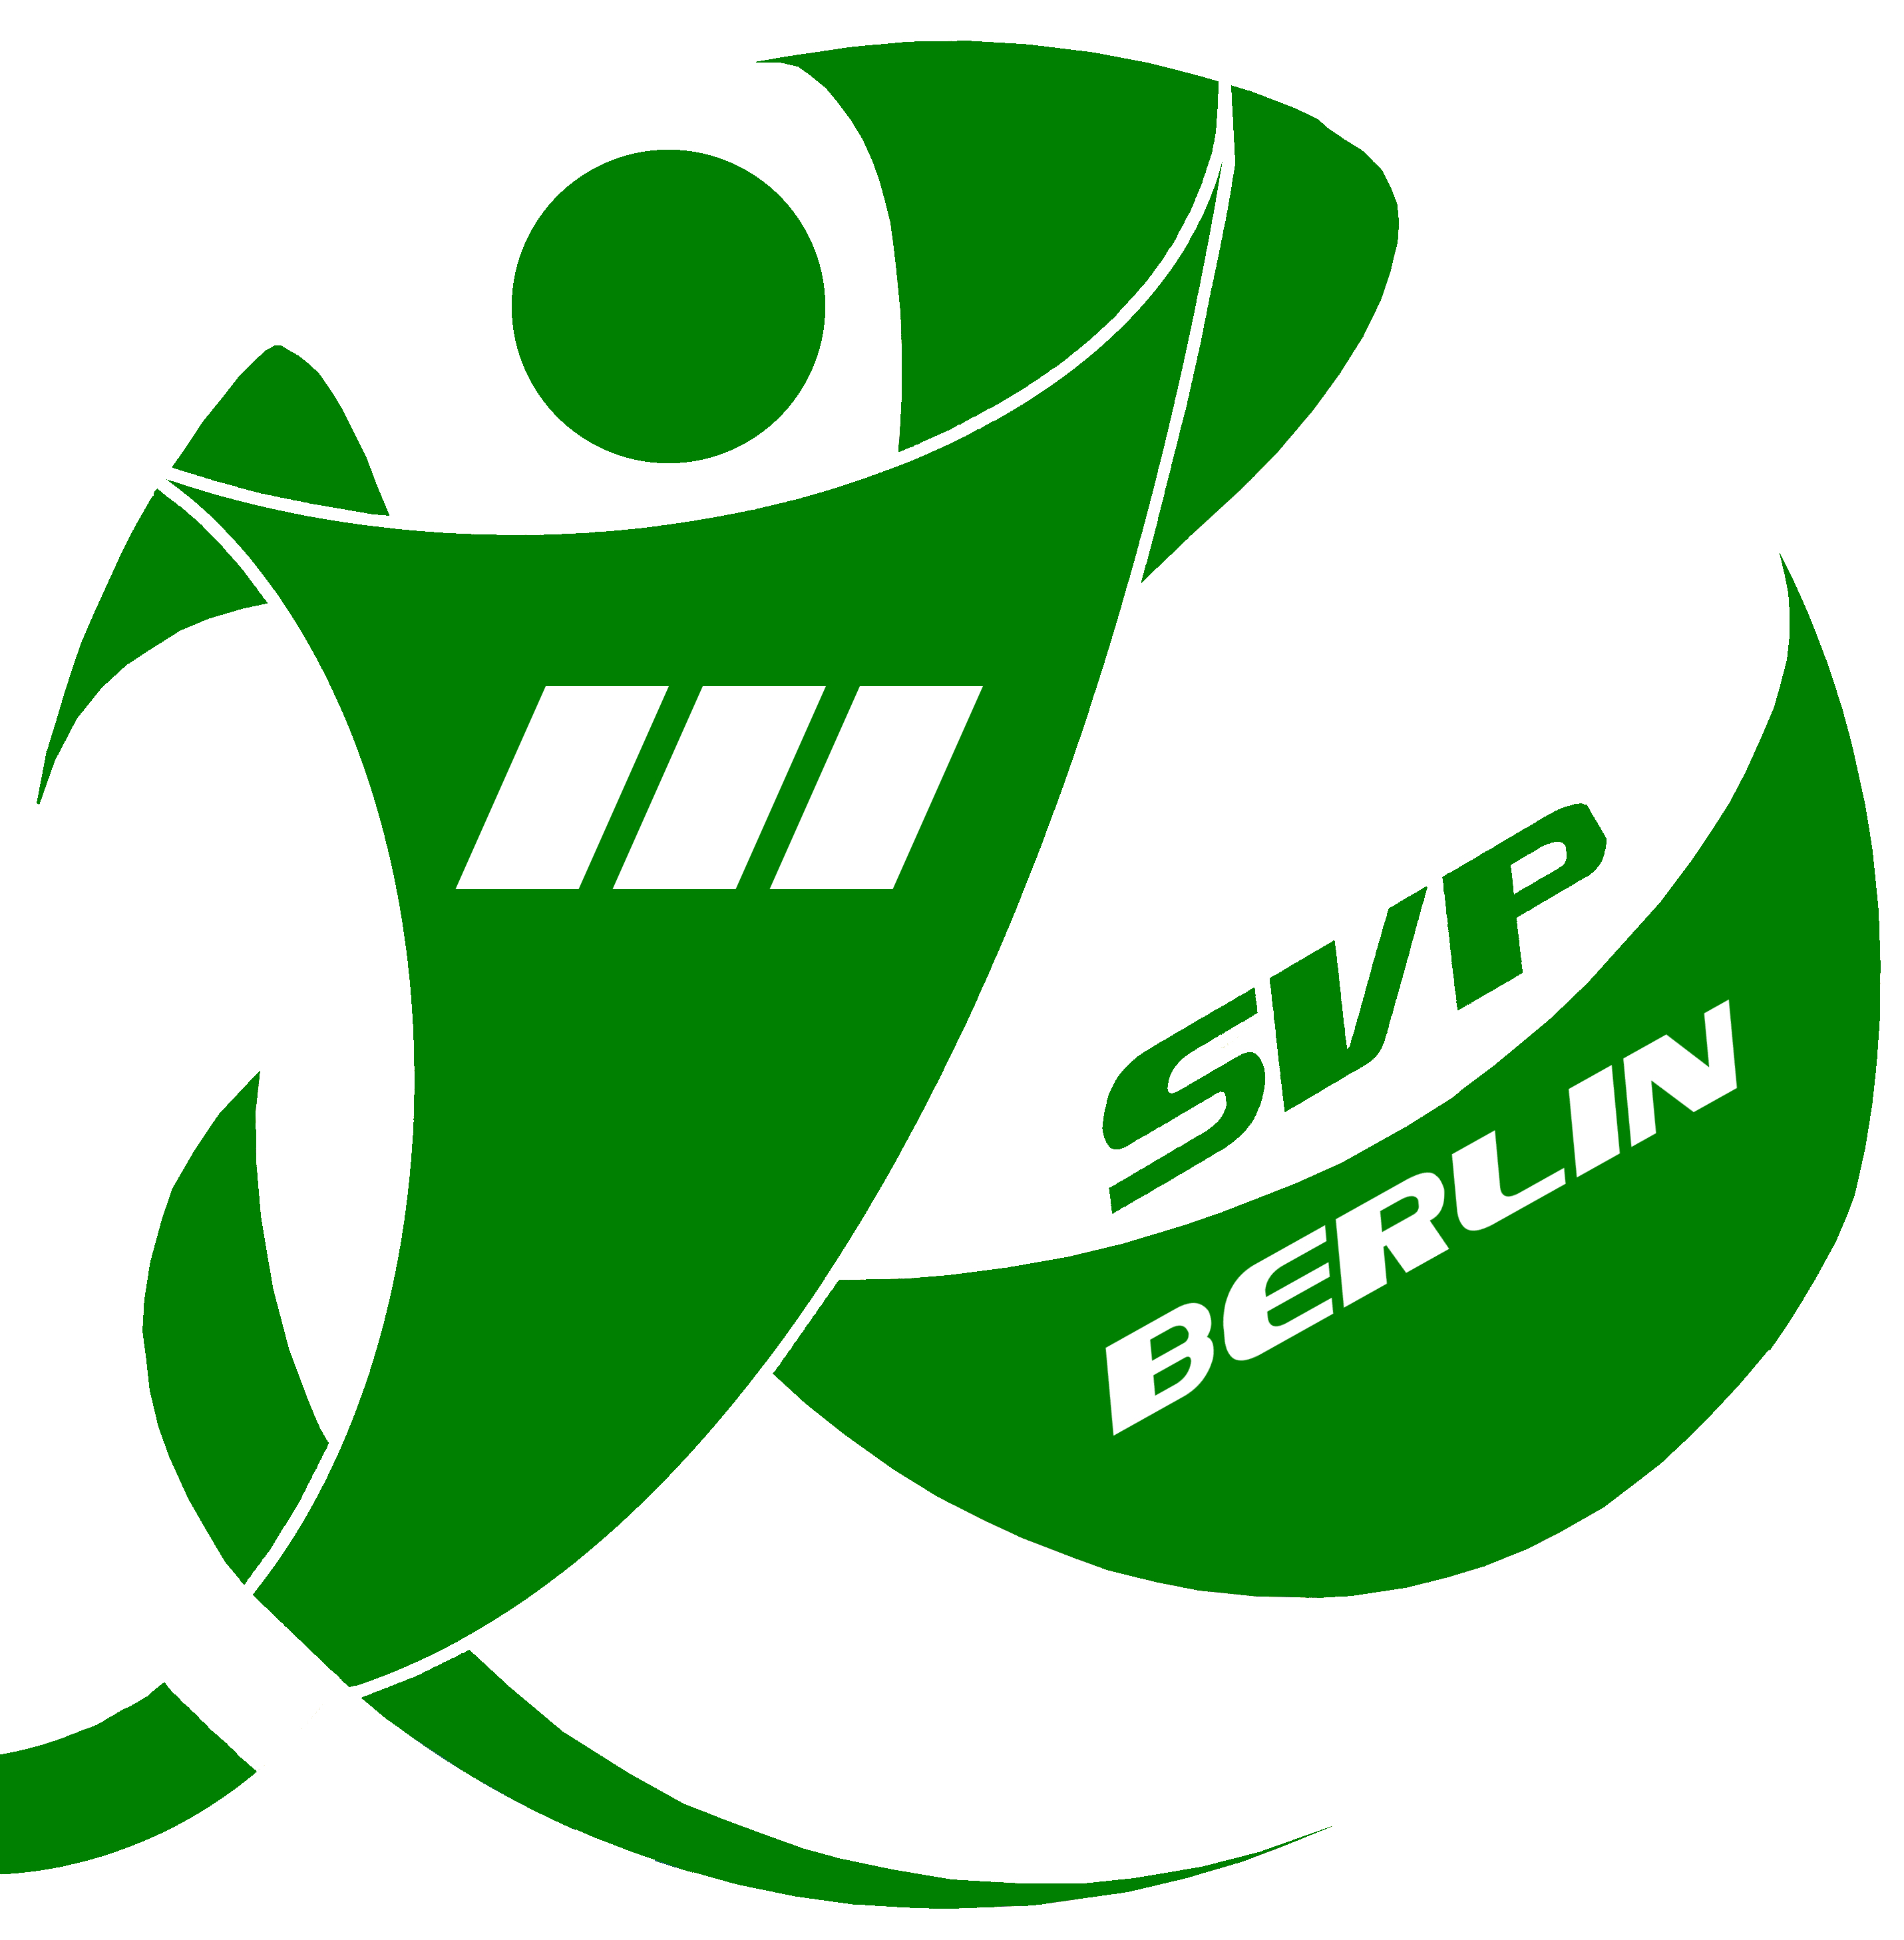 SVP III - Fried - RPB V @ Preußenarena